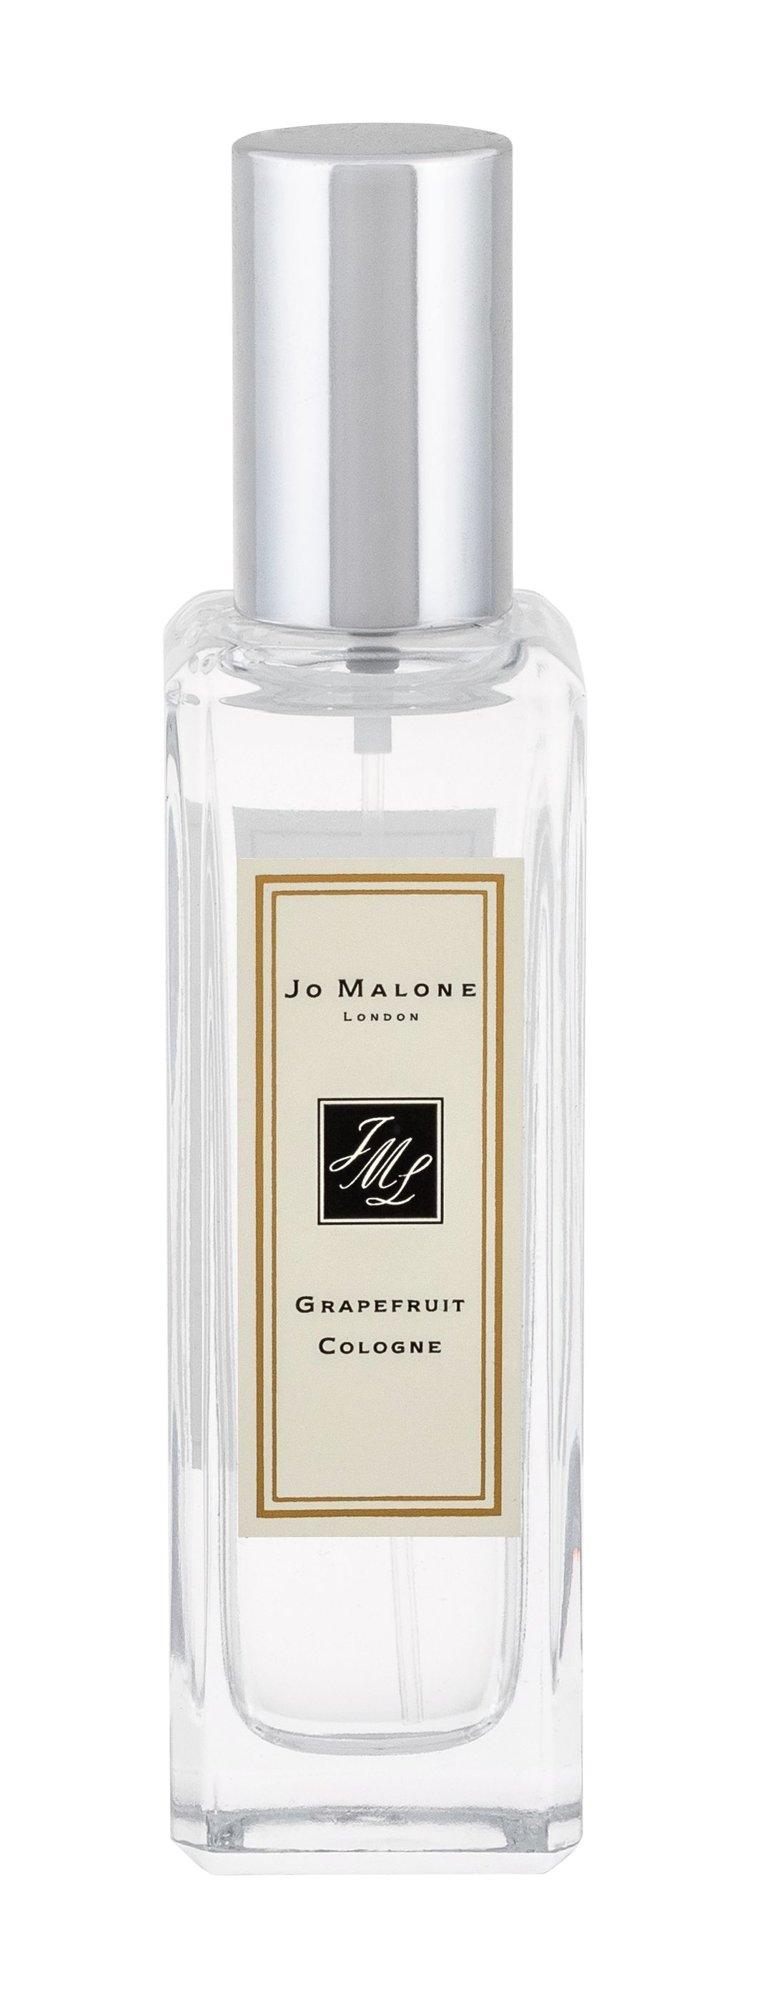 Jo Malone Grapefruit, edc 30ml - Teszter